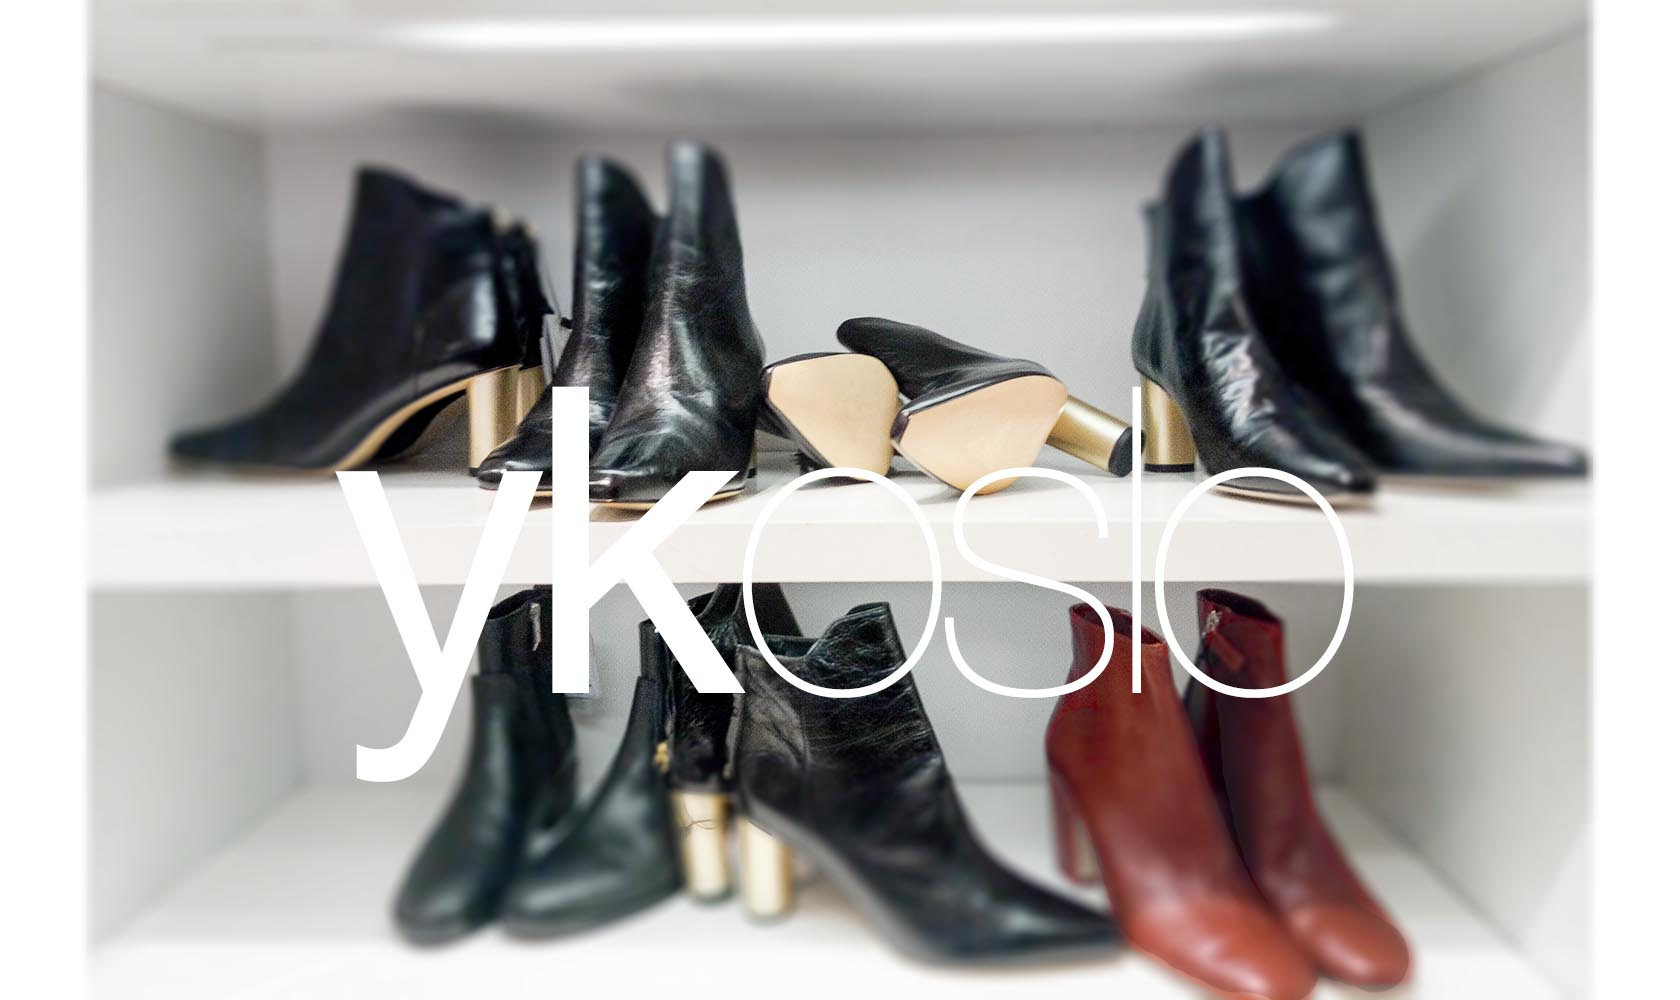 ykoslo__7c